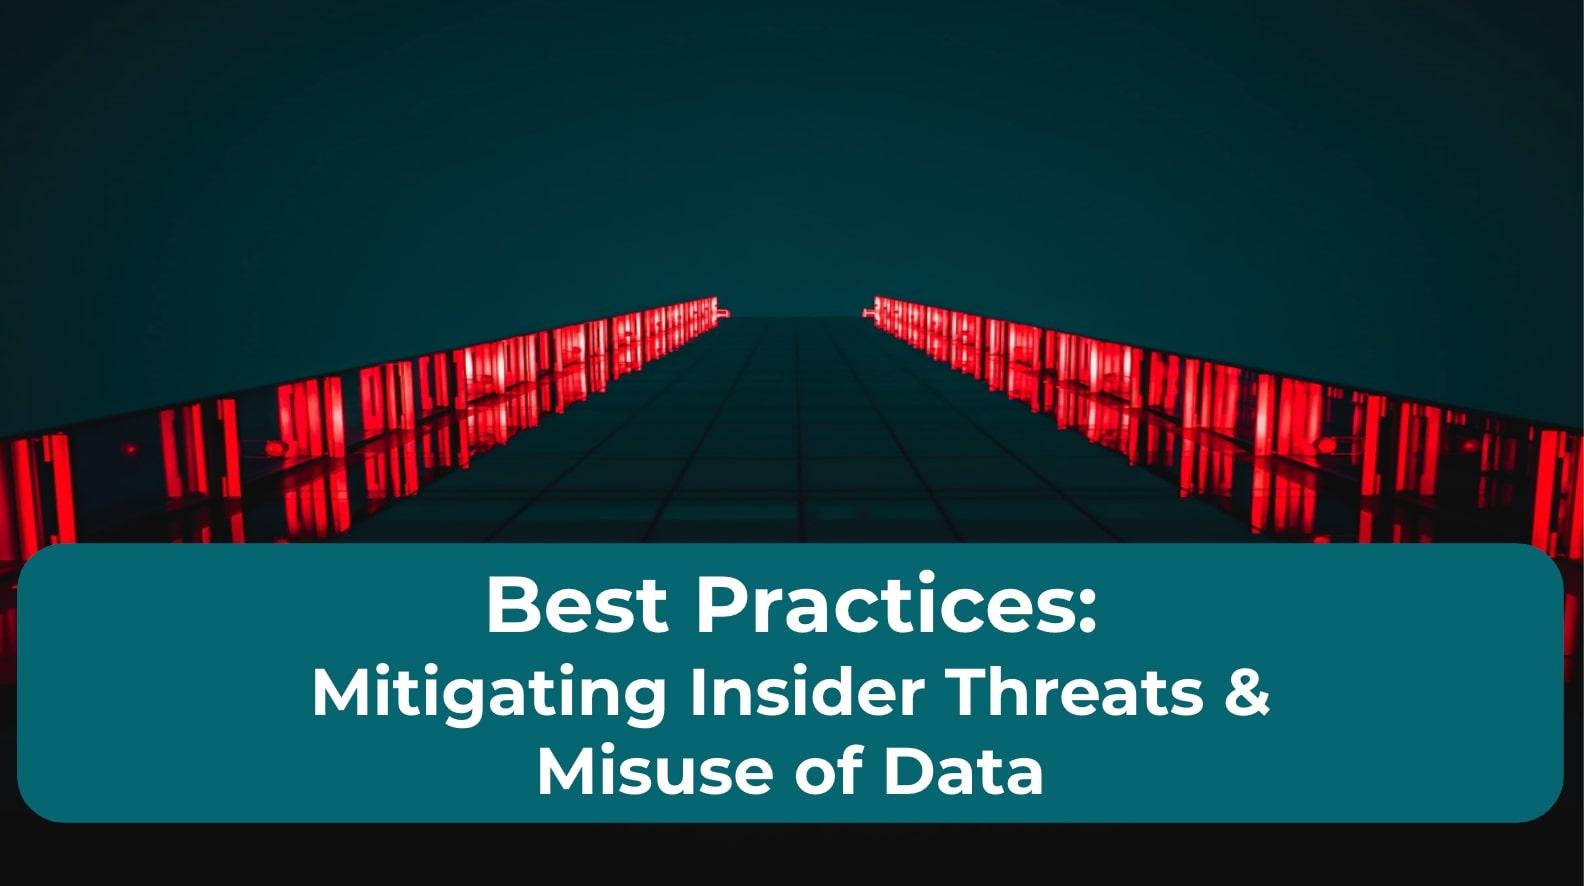 Best Practices: Mitigating Insider Threats & Misuse of Data